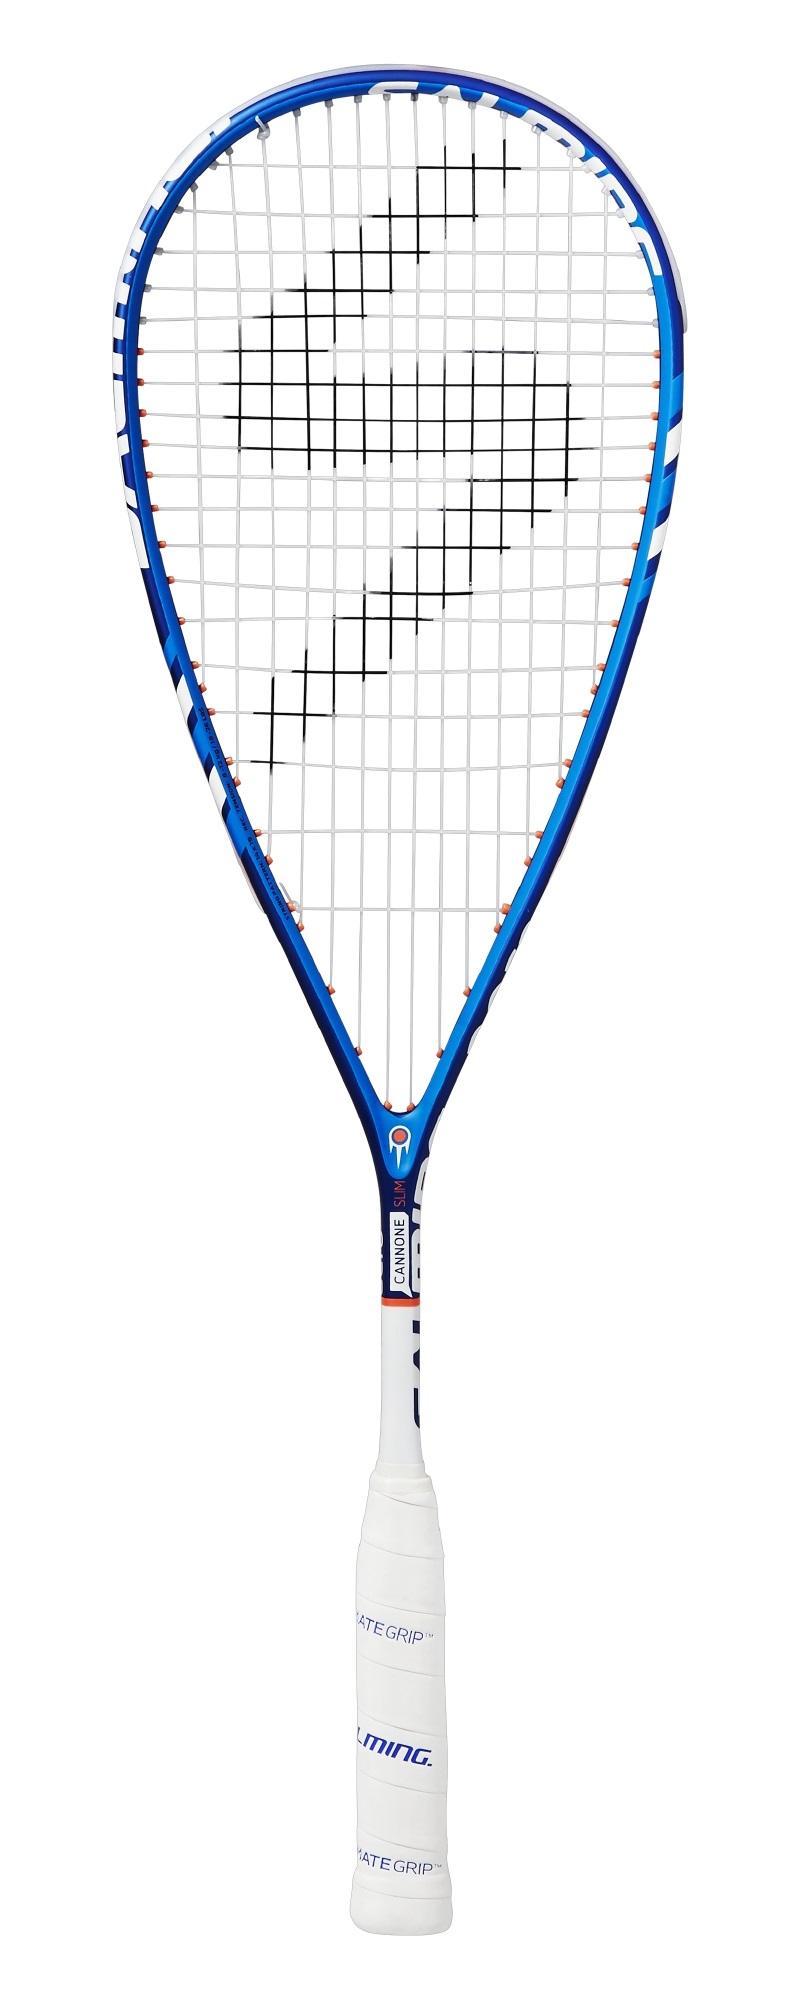 Salming Cannone Slim Aero 2017 blau Squashschläger